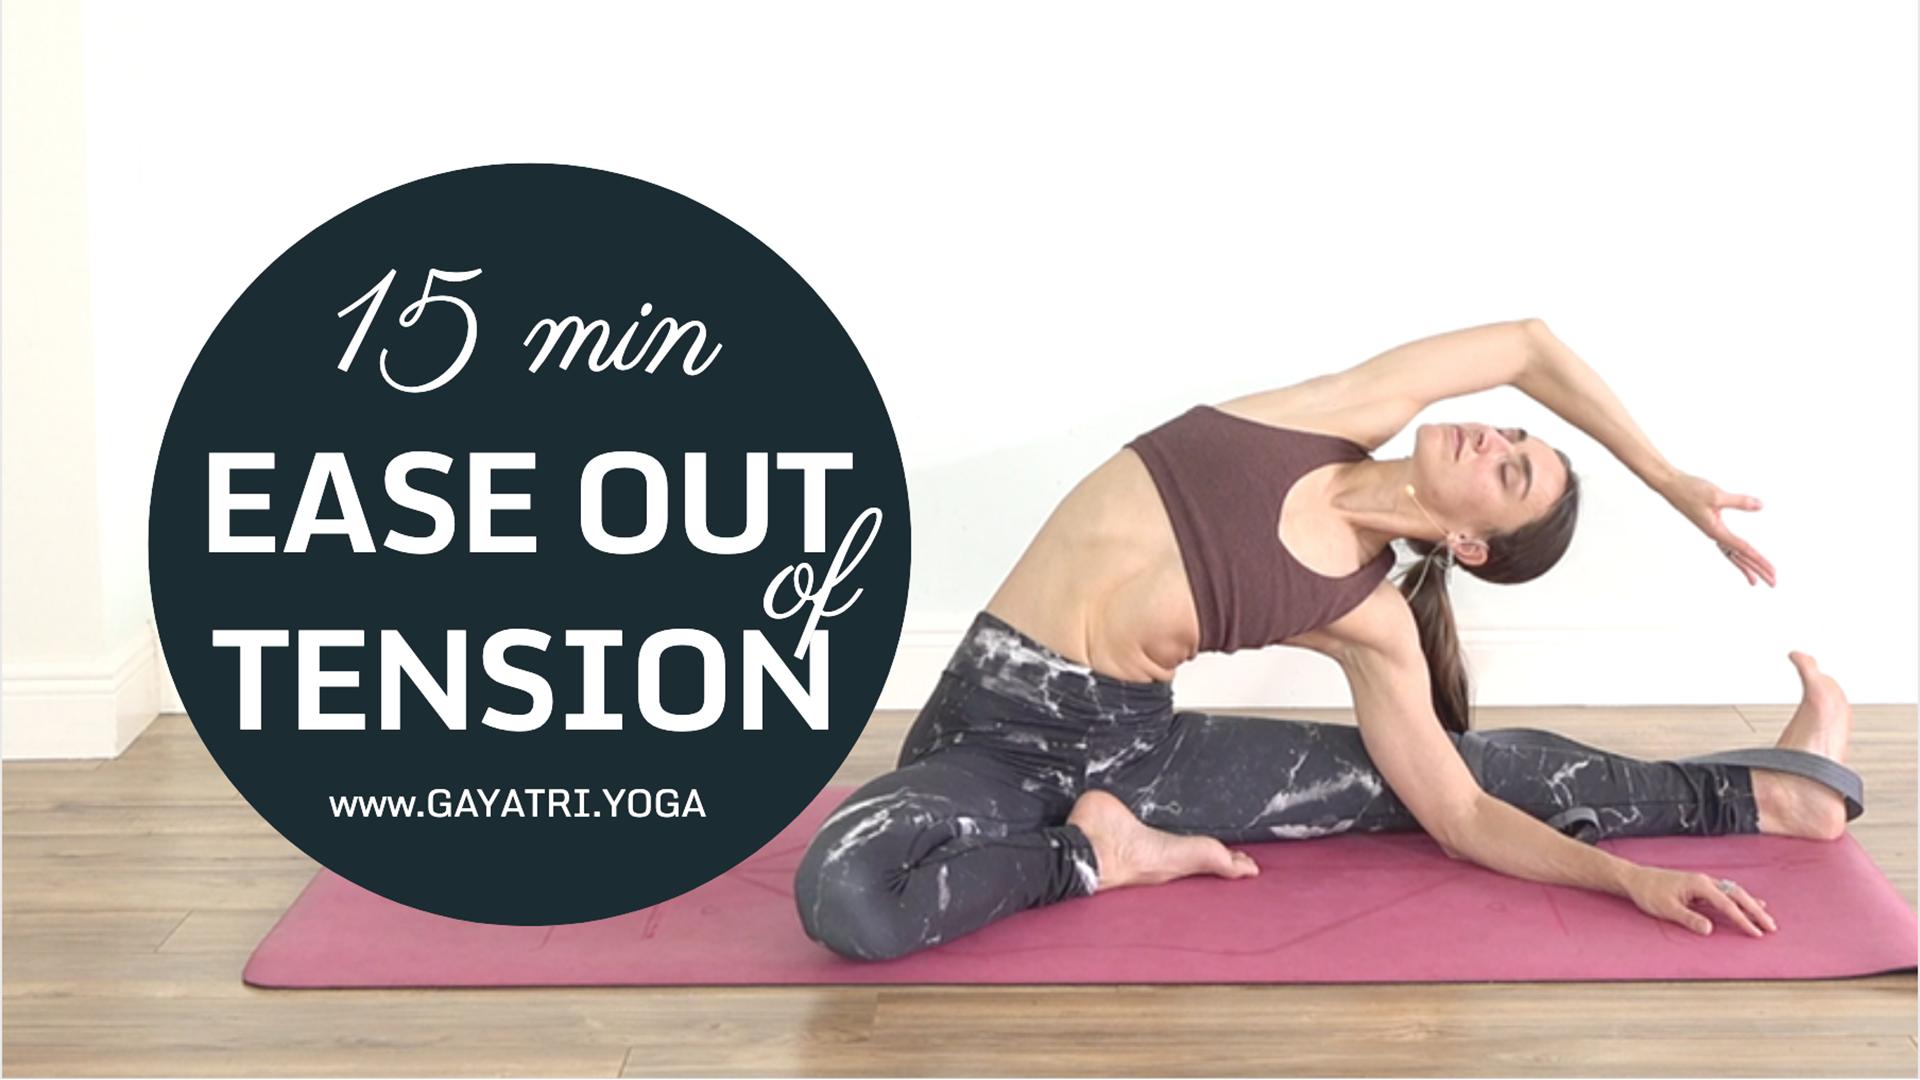 15 Min Ease Out Of Tension - Lower Back & Hips Yoga Flow | Gayatri Yoga